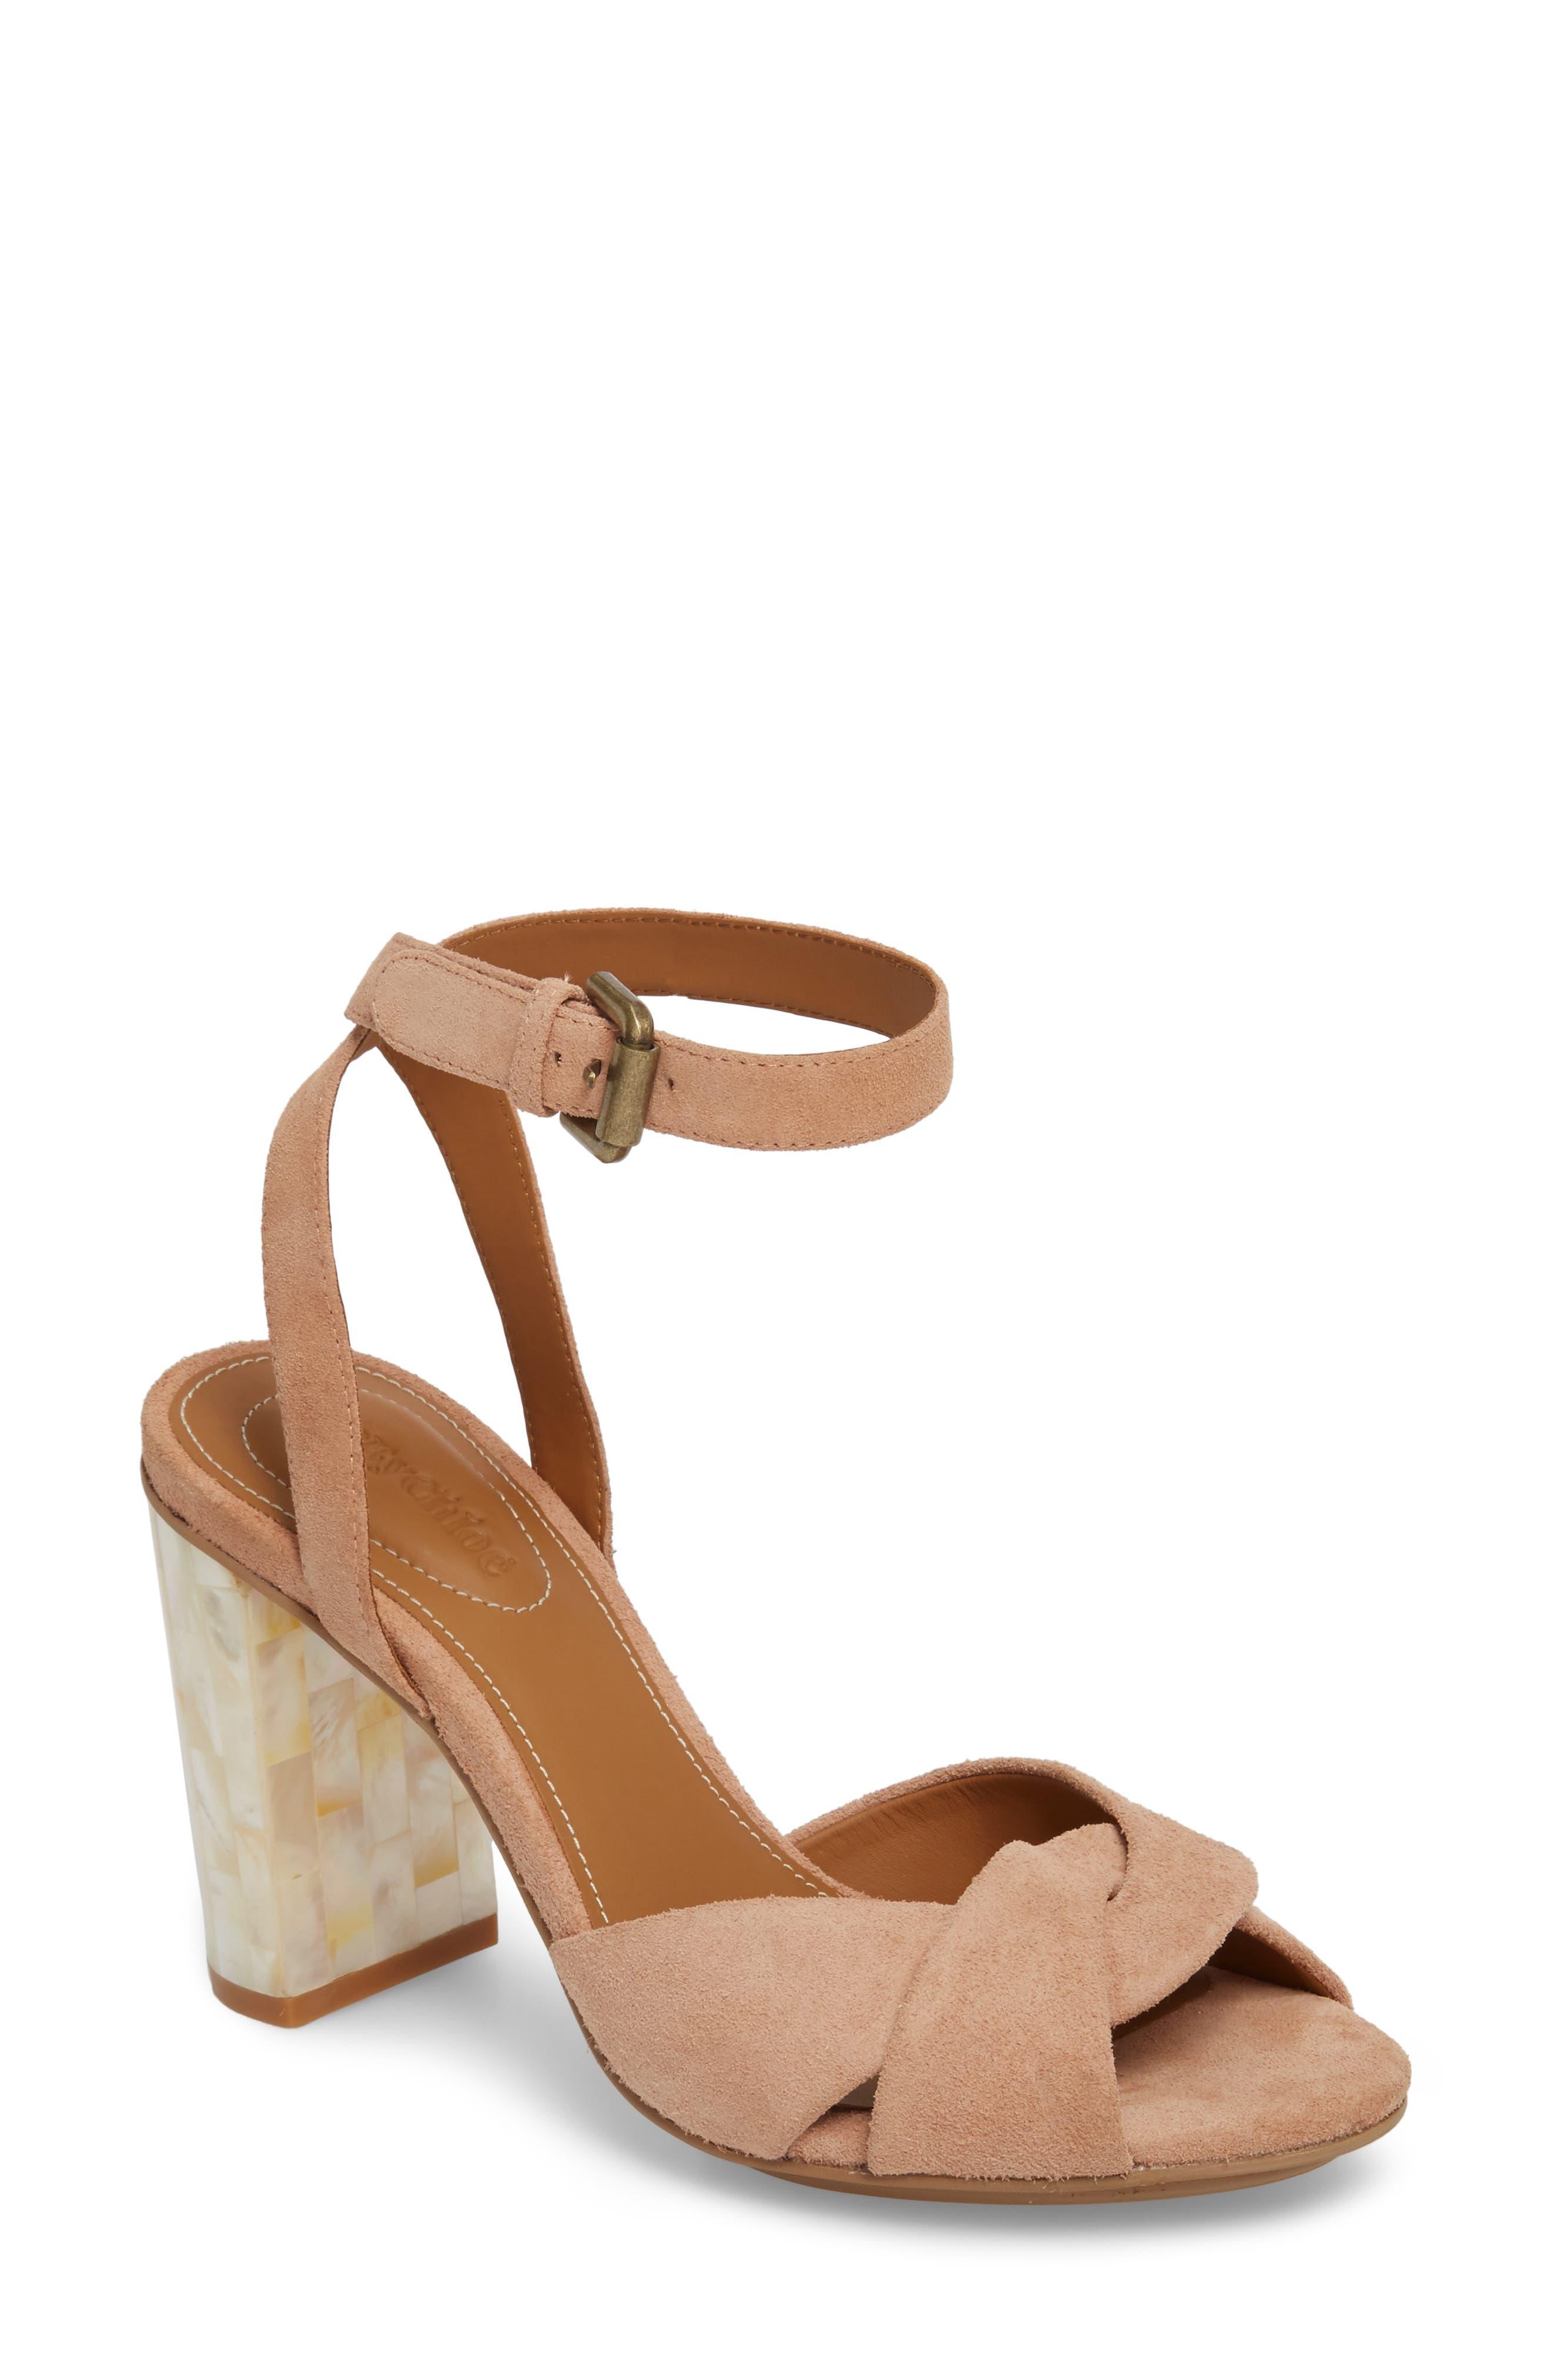 Isida Block Heel Sandal,                         Main,                         color, 210